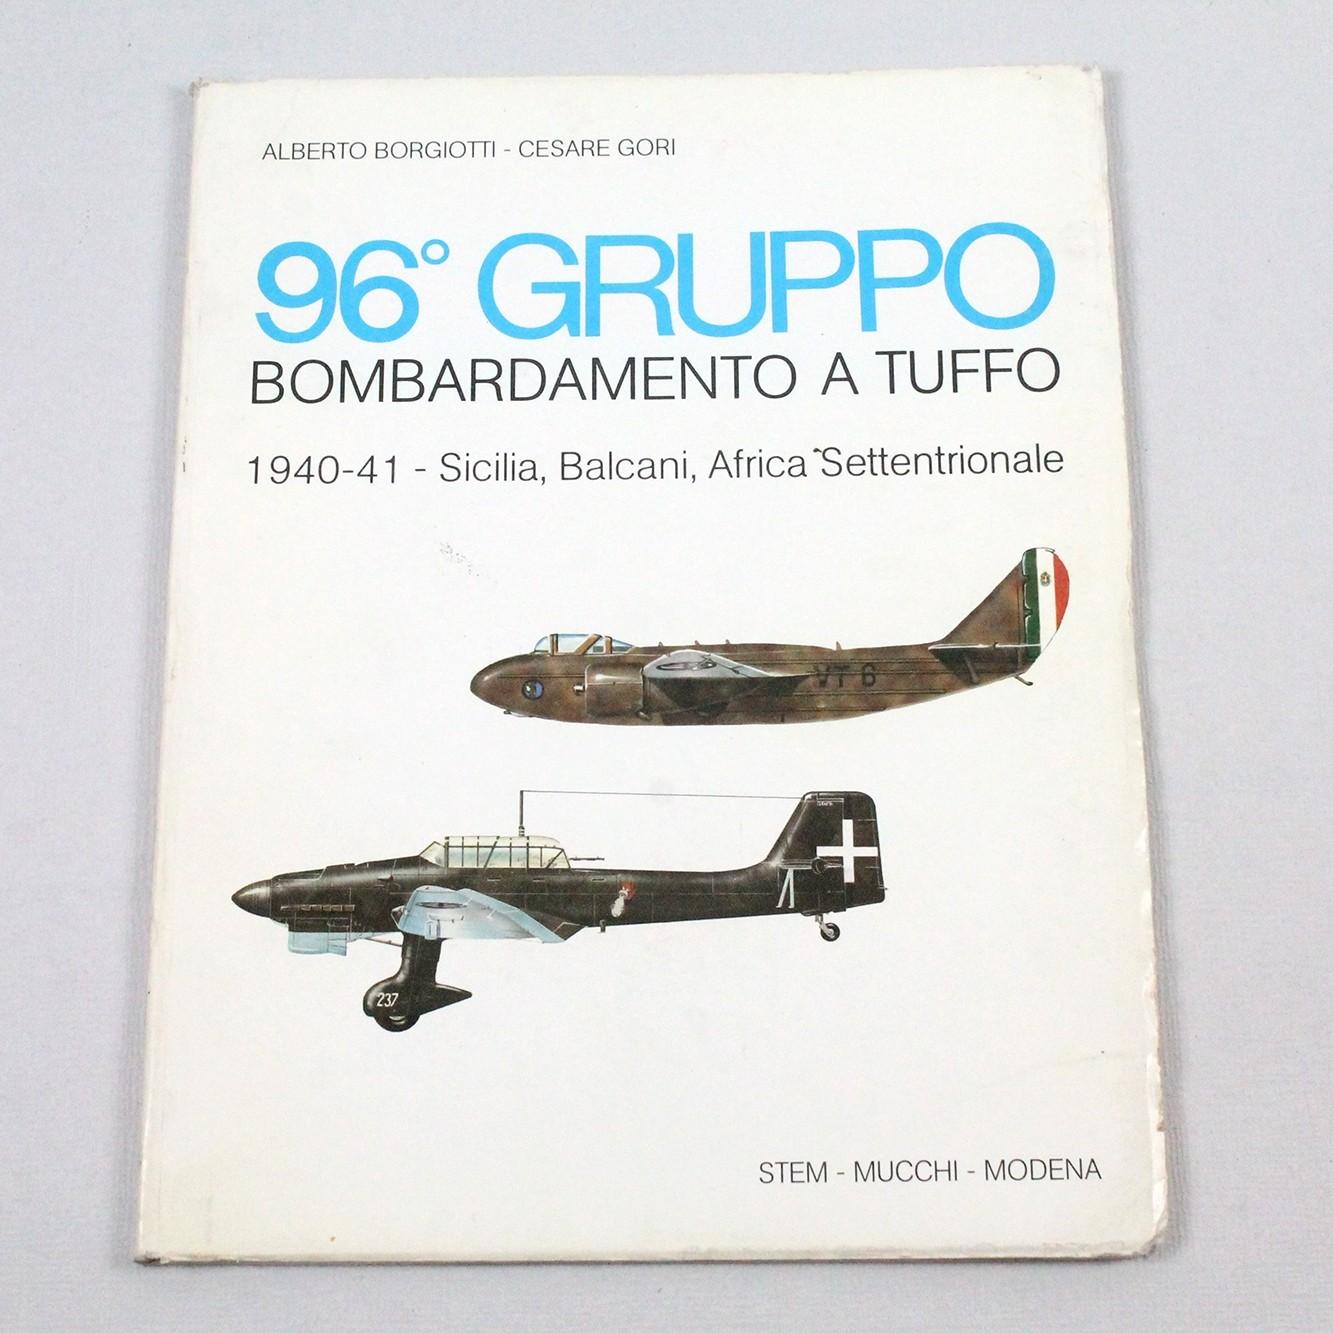 LIBIT-96 GRUPPO BOMBARDAMENTO A TUFFO